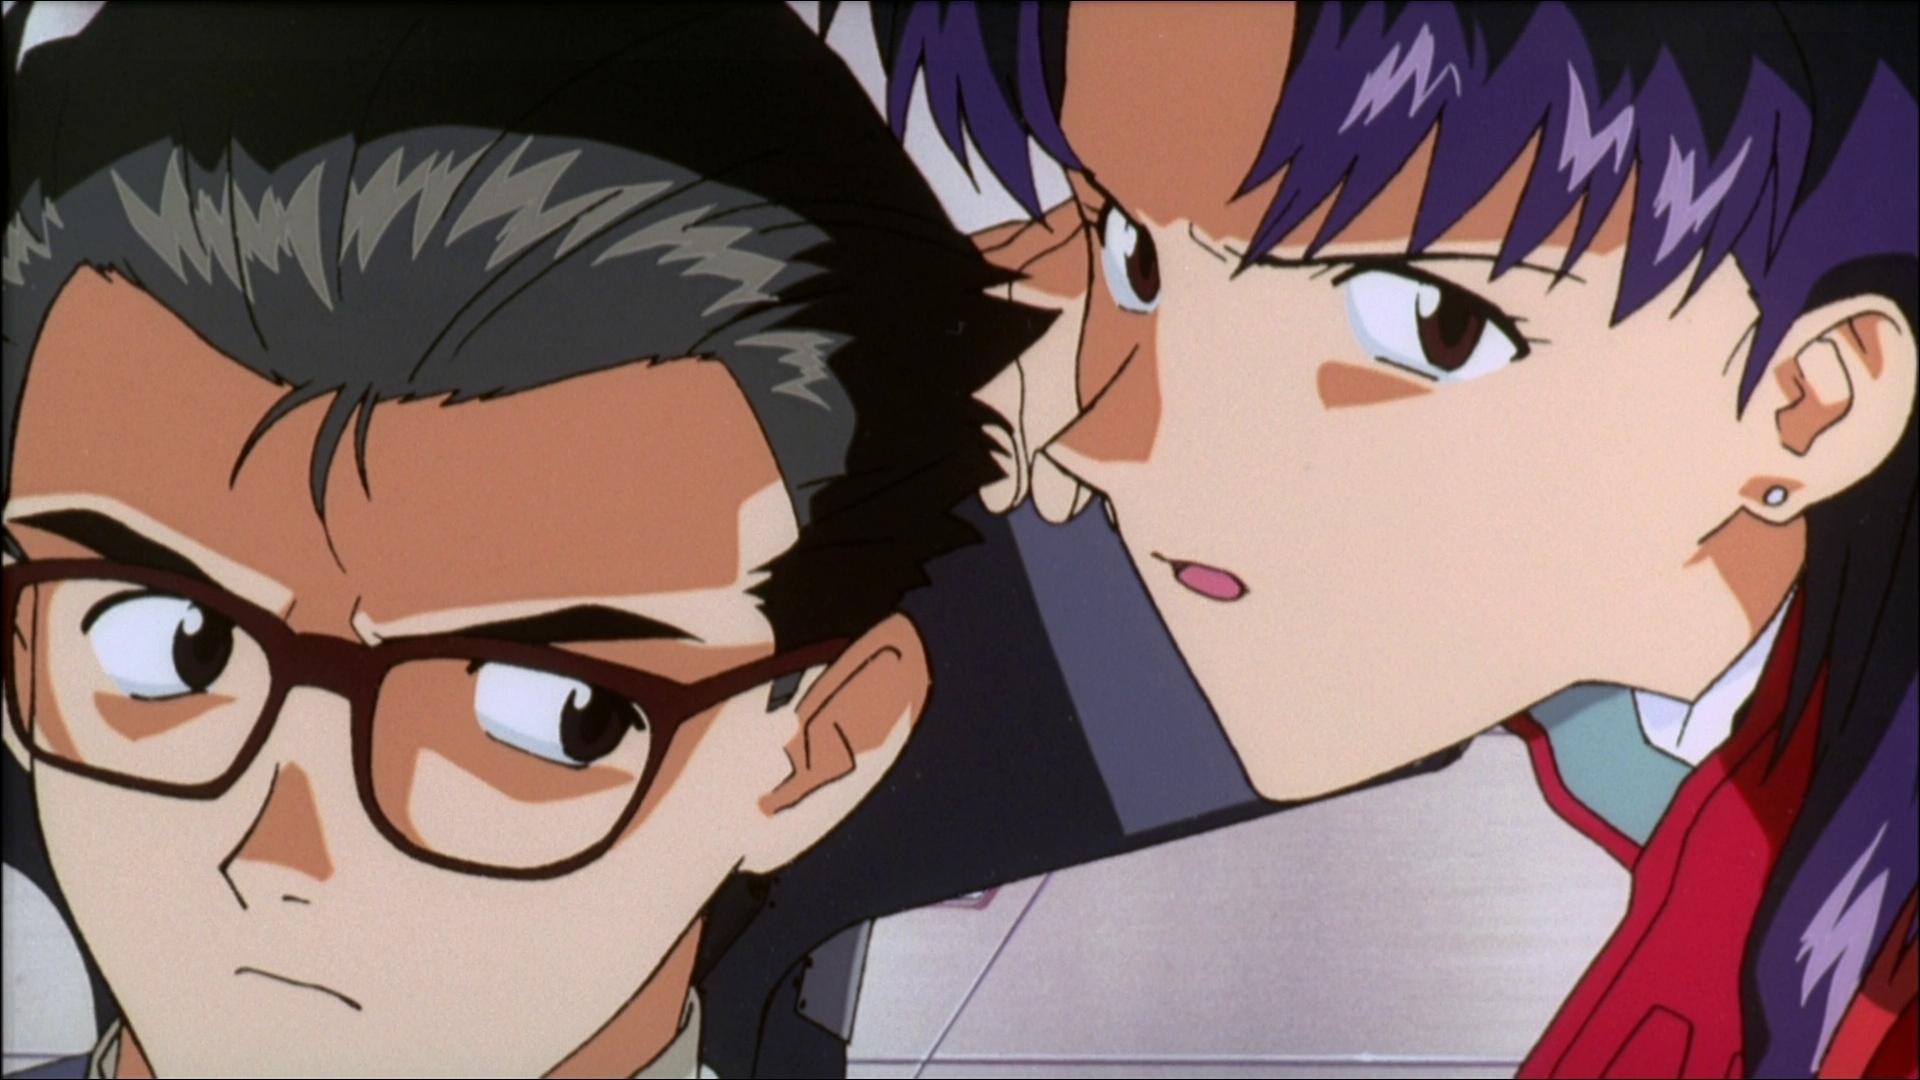 Евангелион (新世紀エヴァンゲリオン, Neon Genesis Evangelion) японское аниме